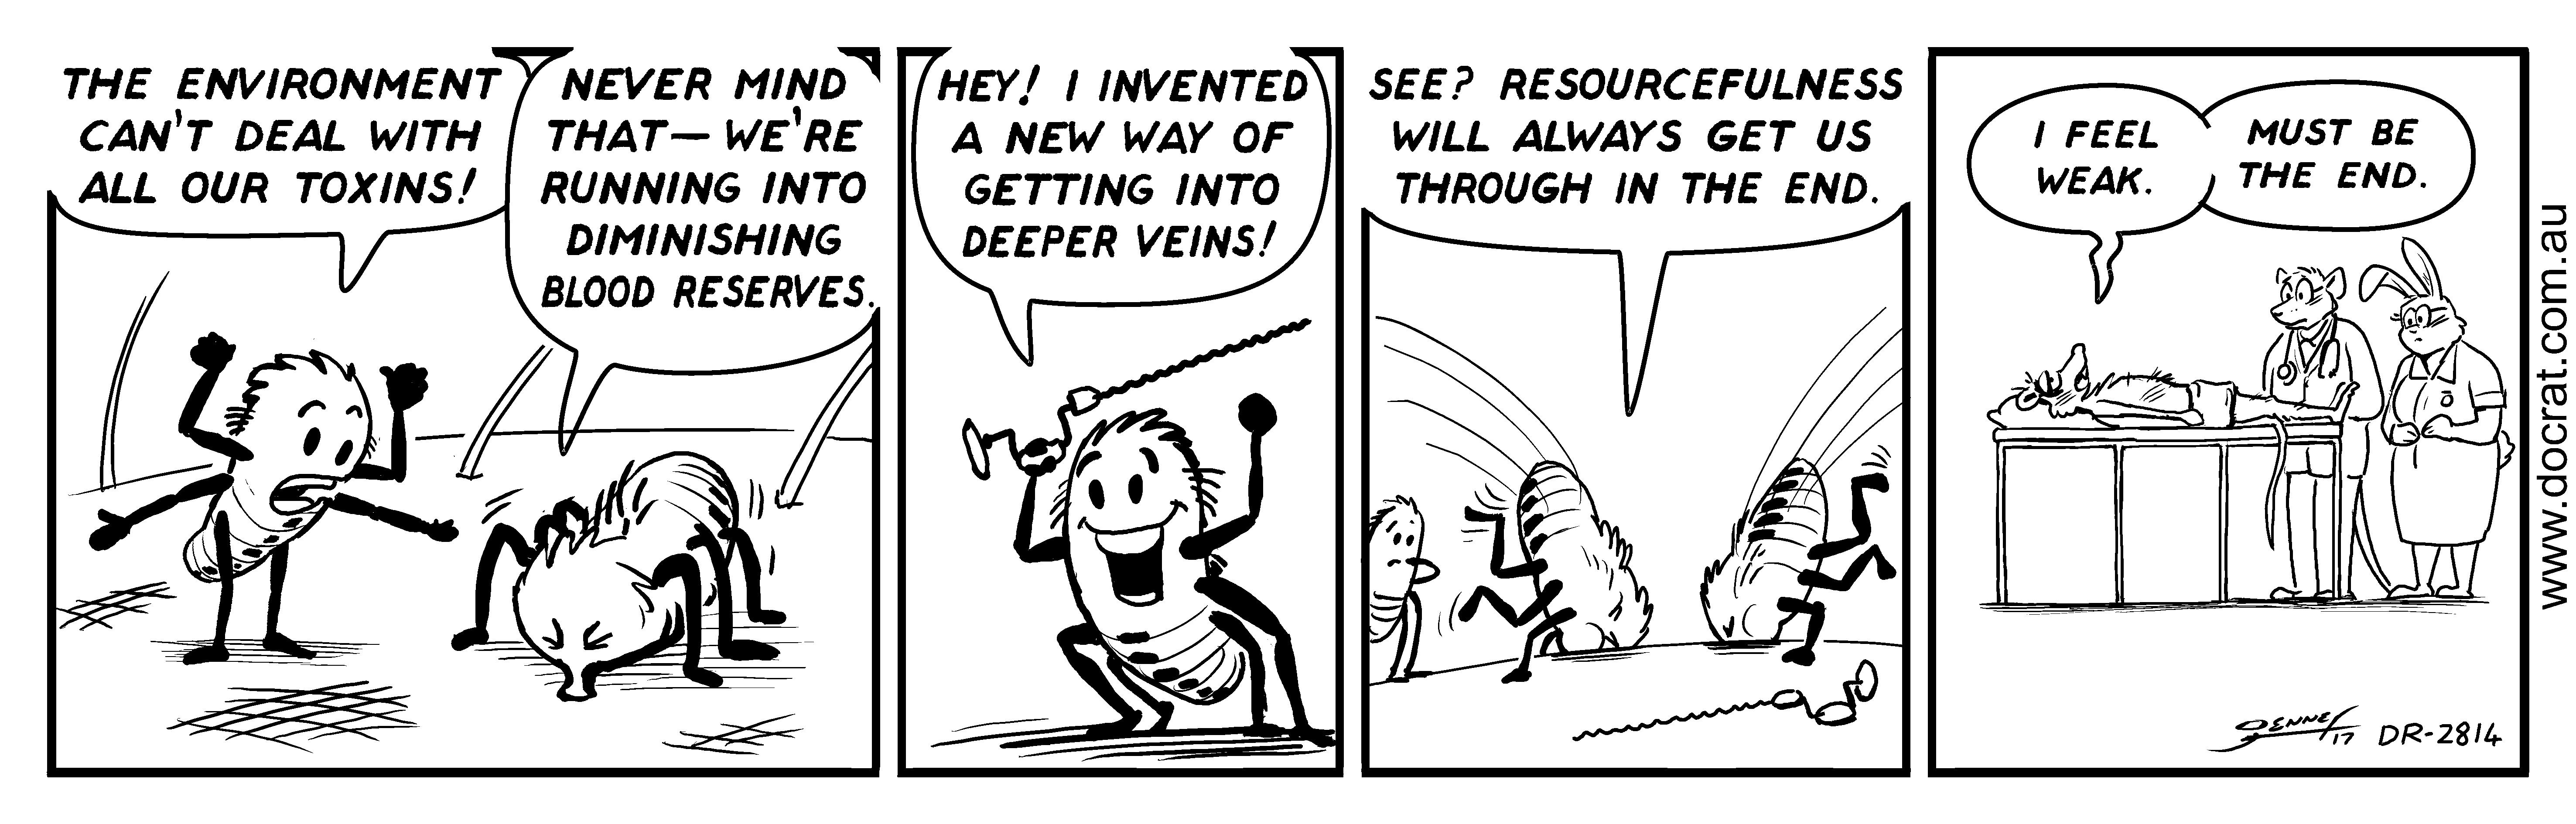 20170706